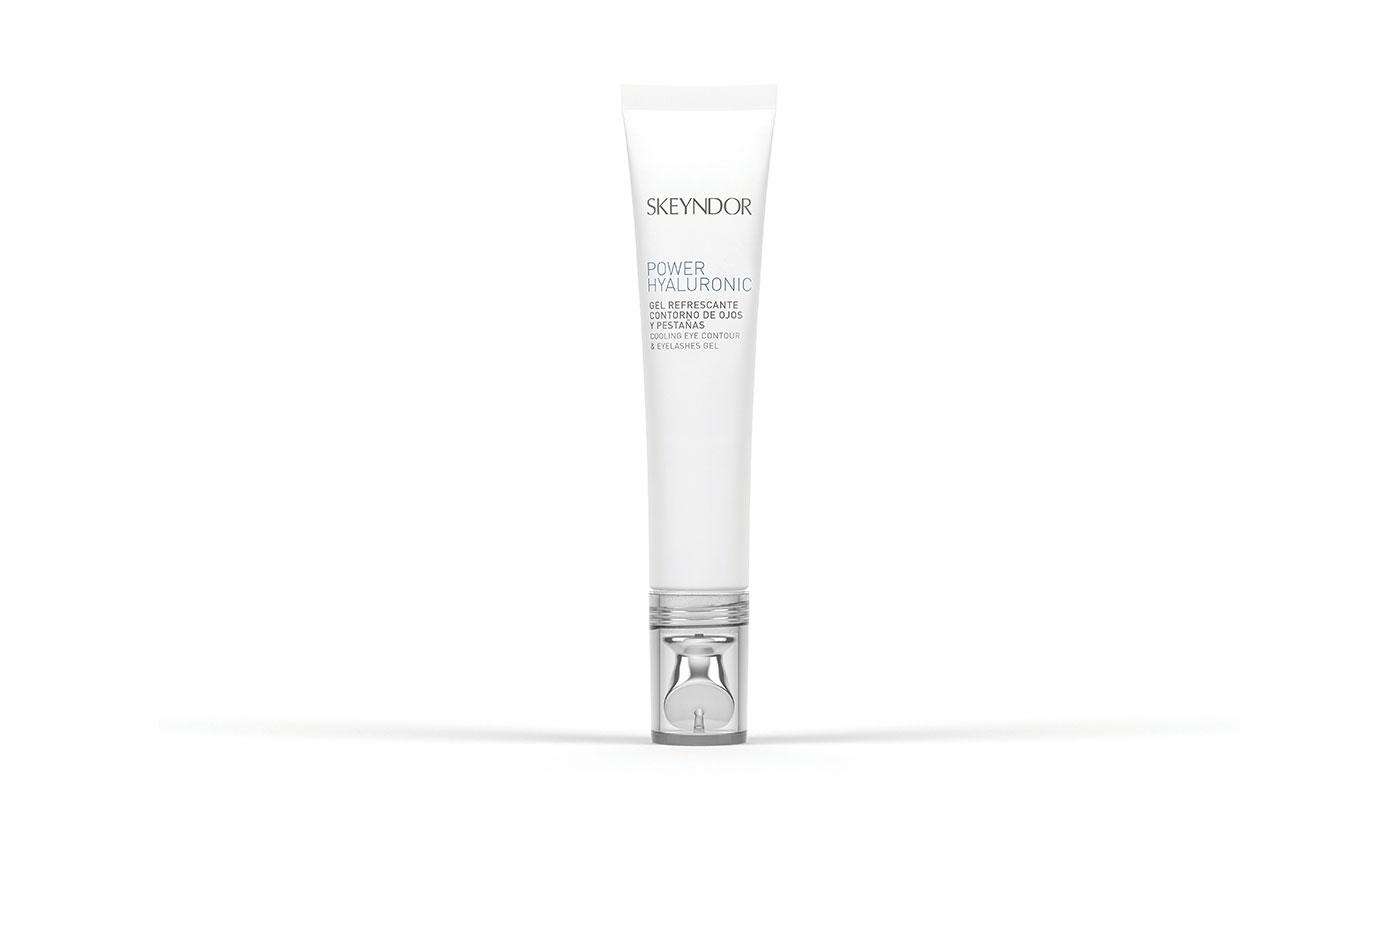 Skeyndor's eye contour and eyelashes gel for strengthening